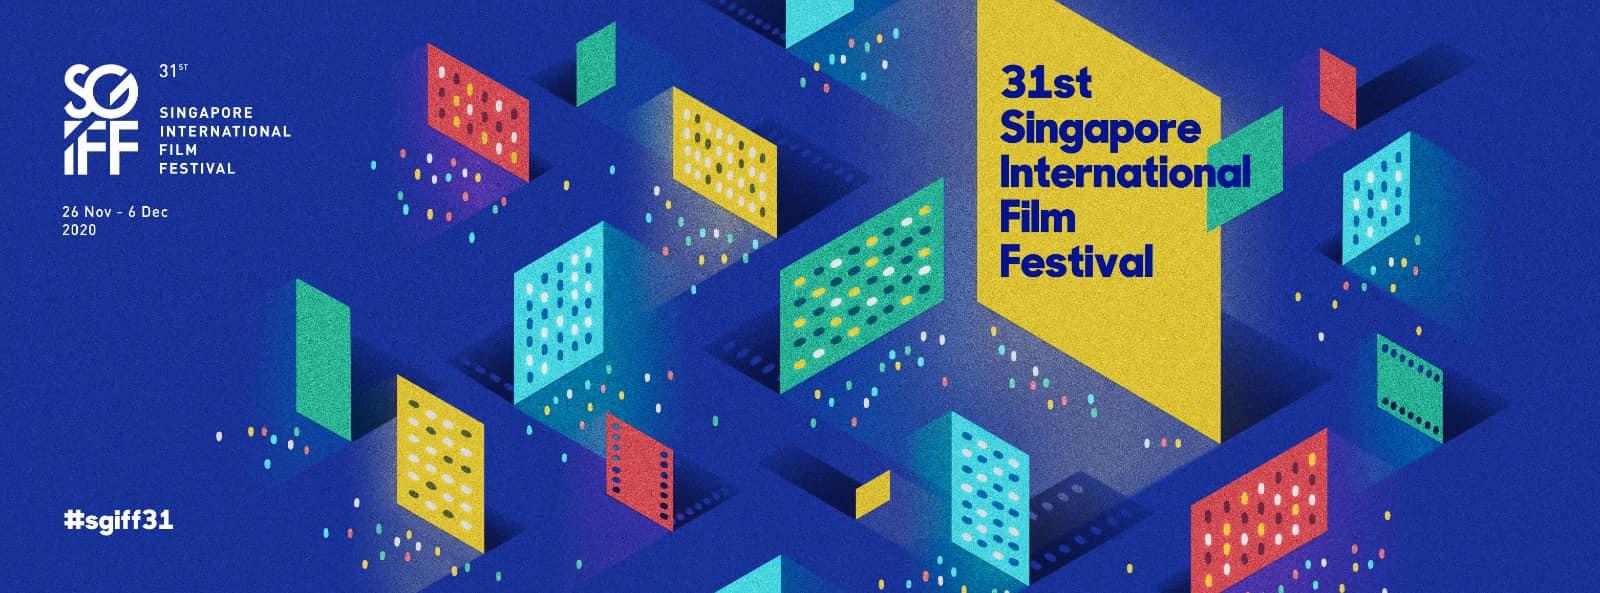 Photo courtesy: Facebook/Singapore International Film Festival - SGIFF